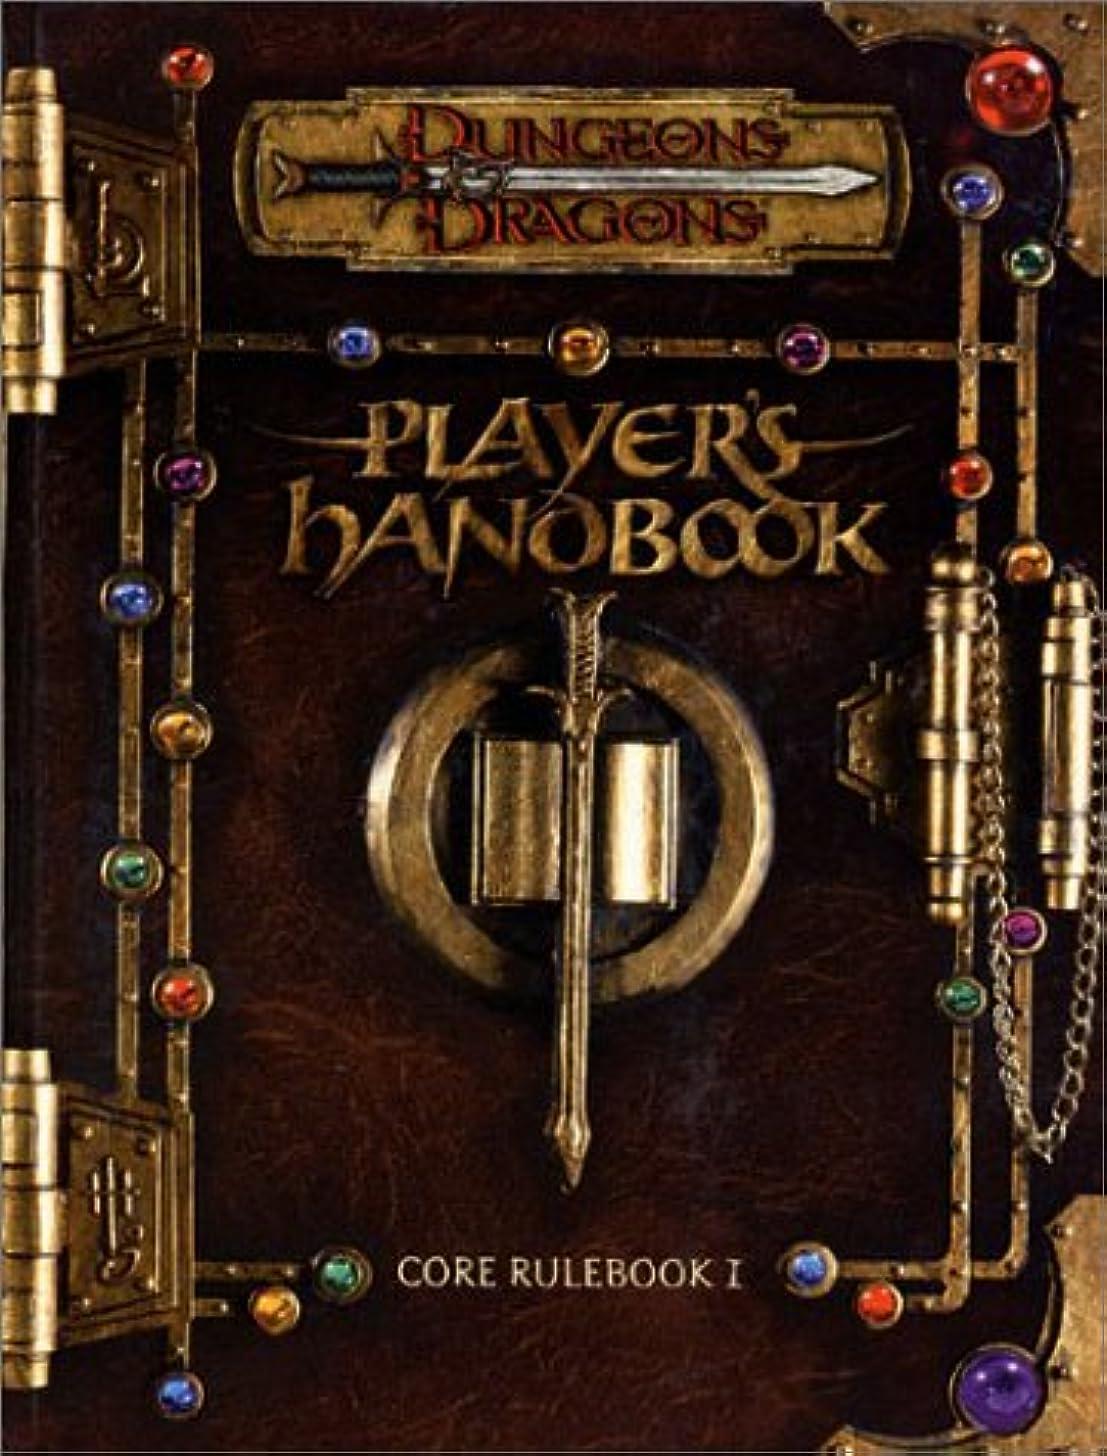 Dungeons & Dragons Player's Handbook: Core Rulebook 1